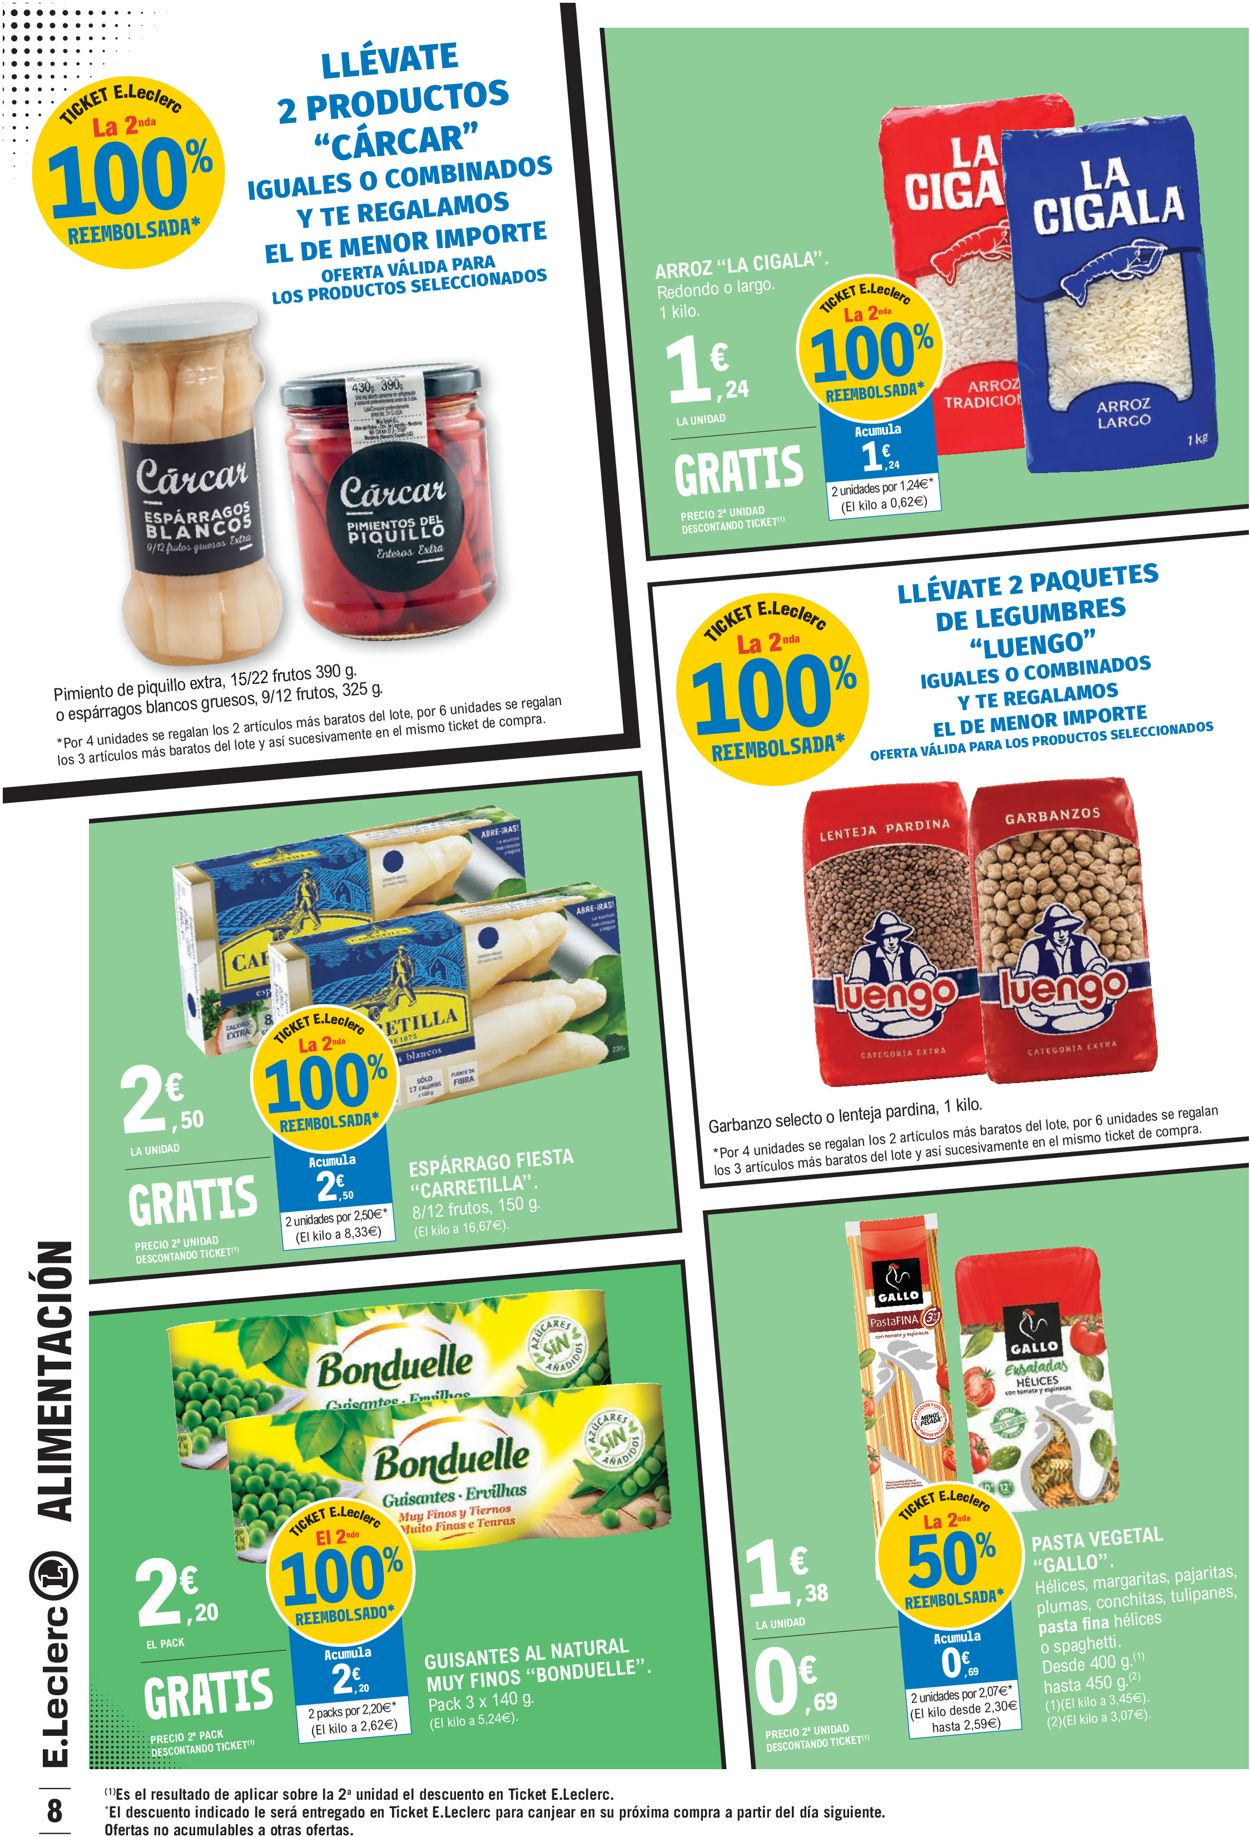 E.leclerc Folleto - 16.09-27.09.2020 (Página 8)